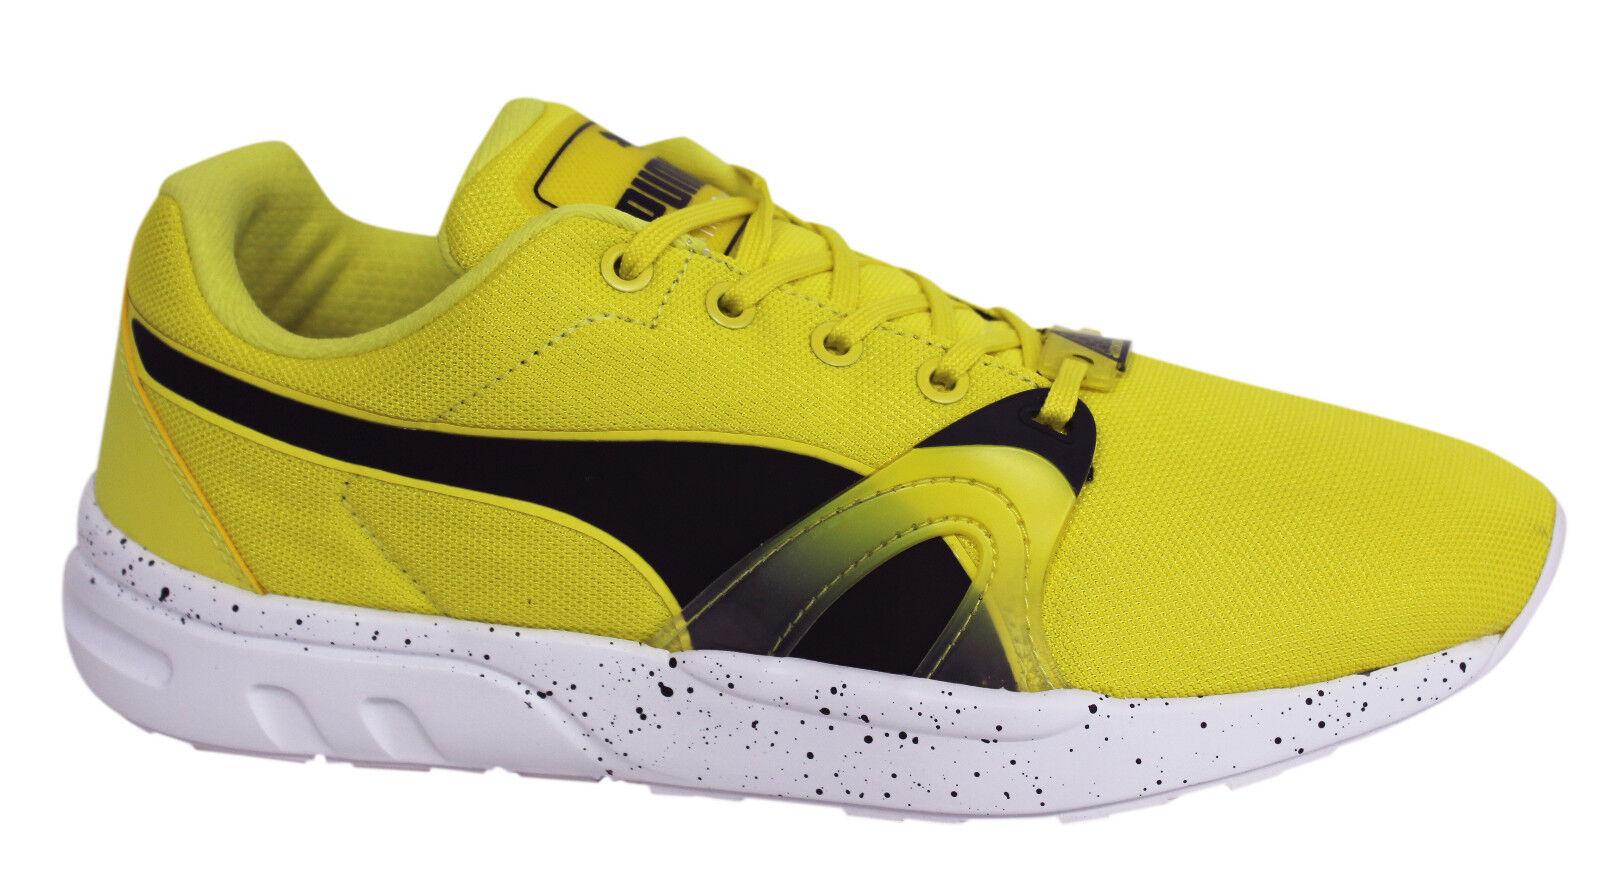 Puma Trinomic XT Original Herren gelb Geschnürte Turnschuhe Laufschuhe 359872 02